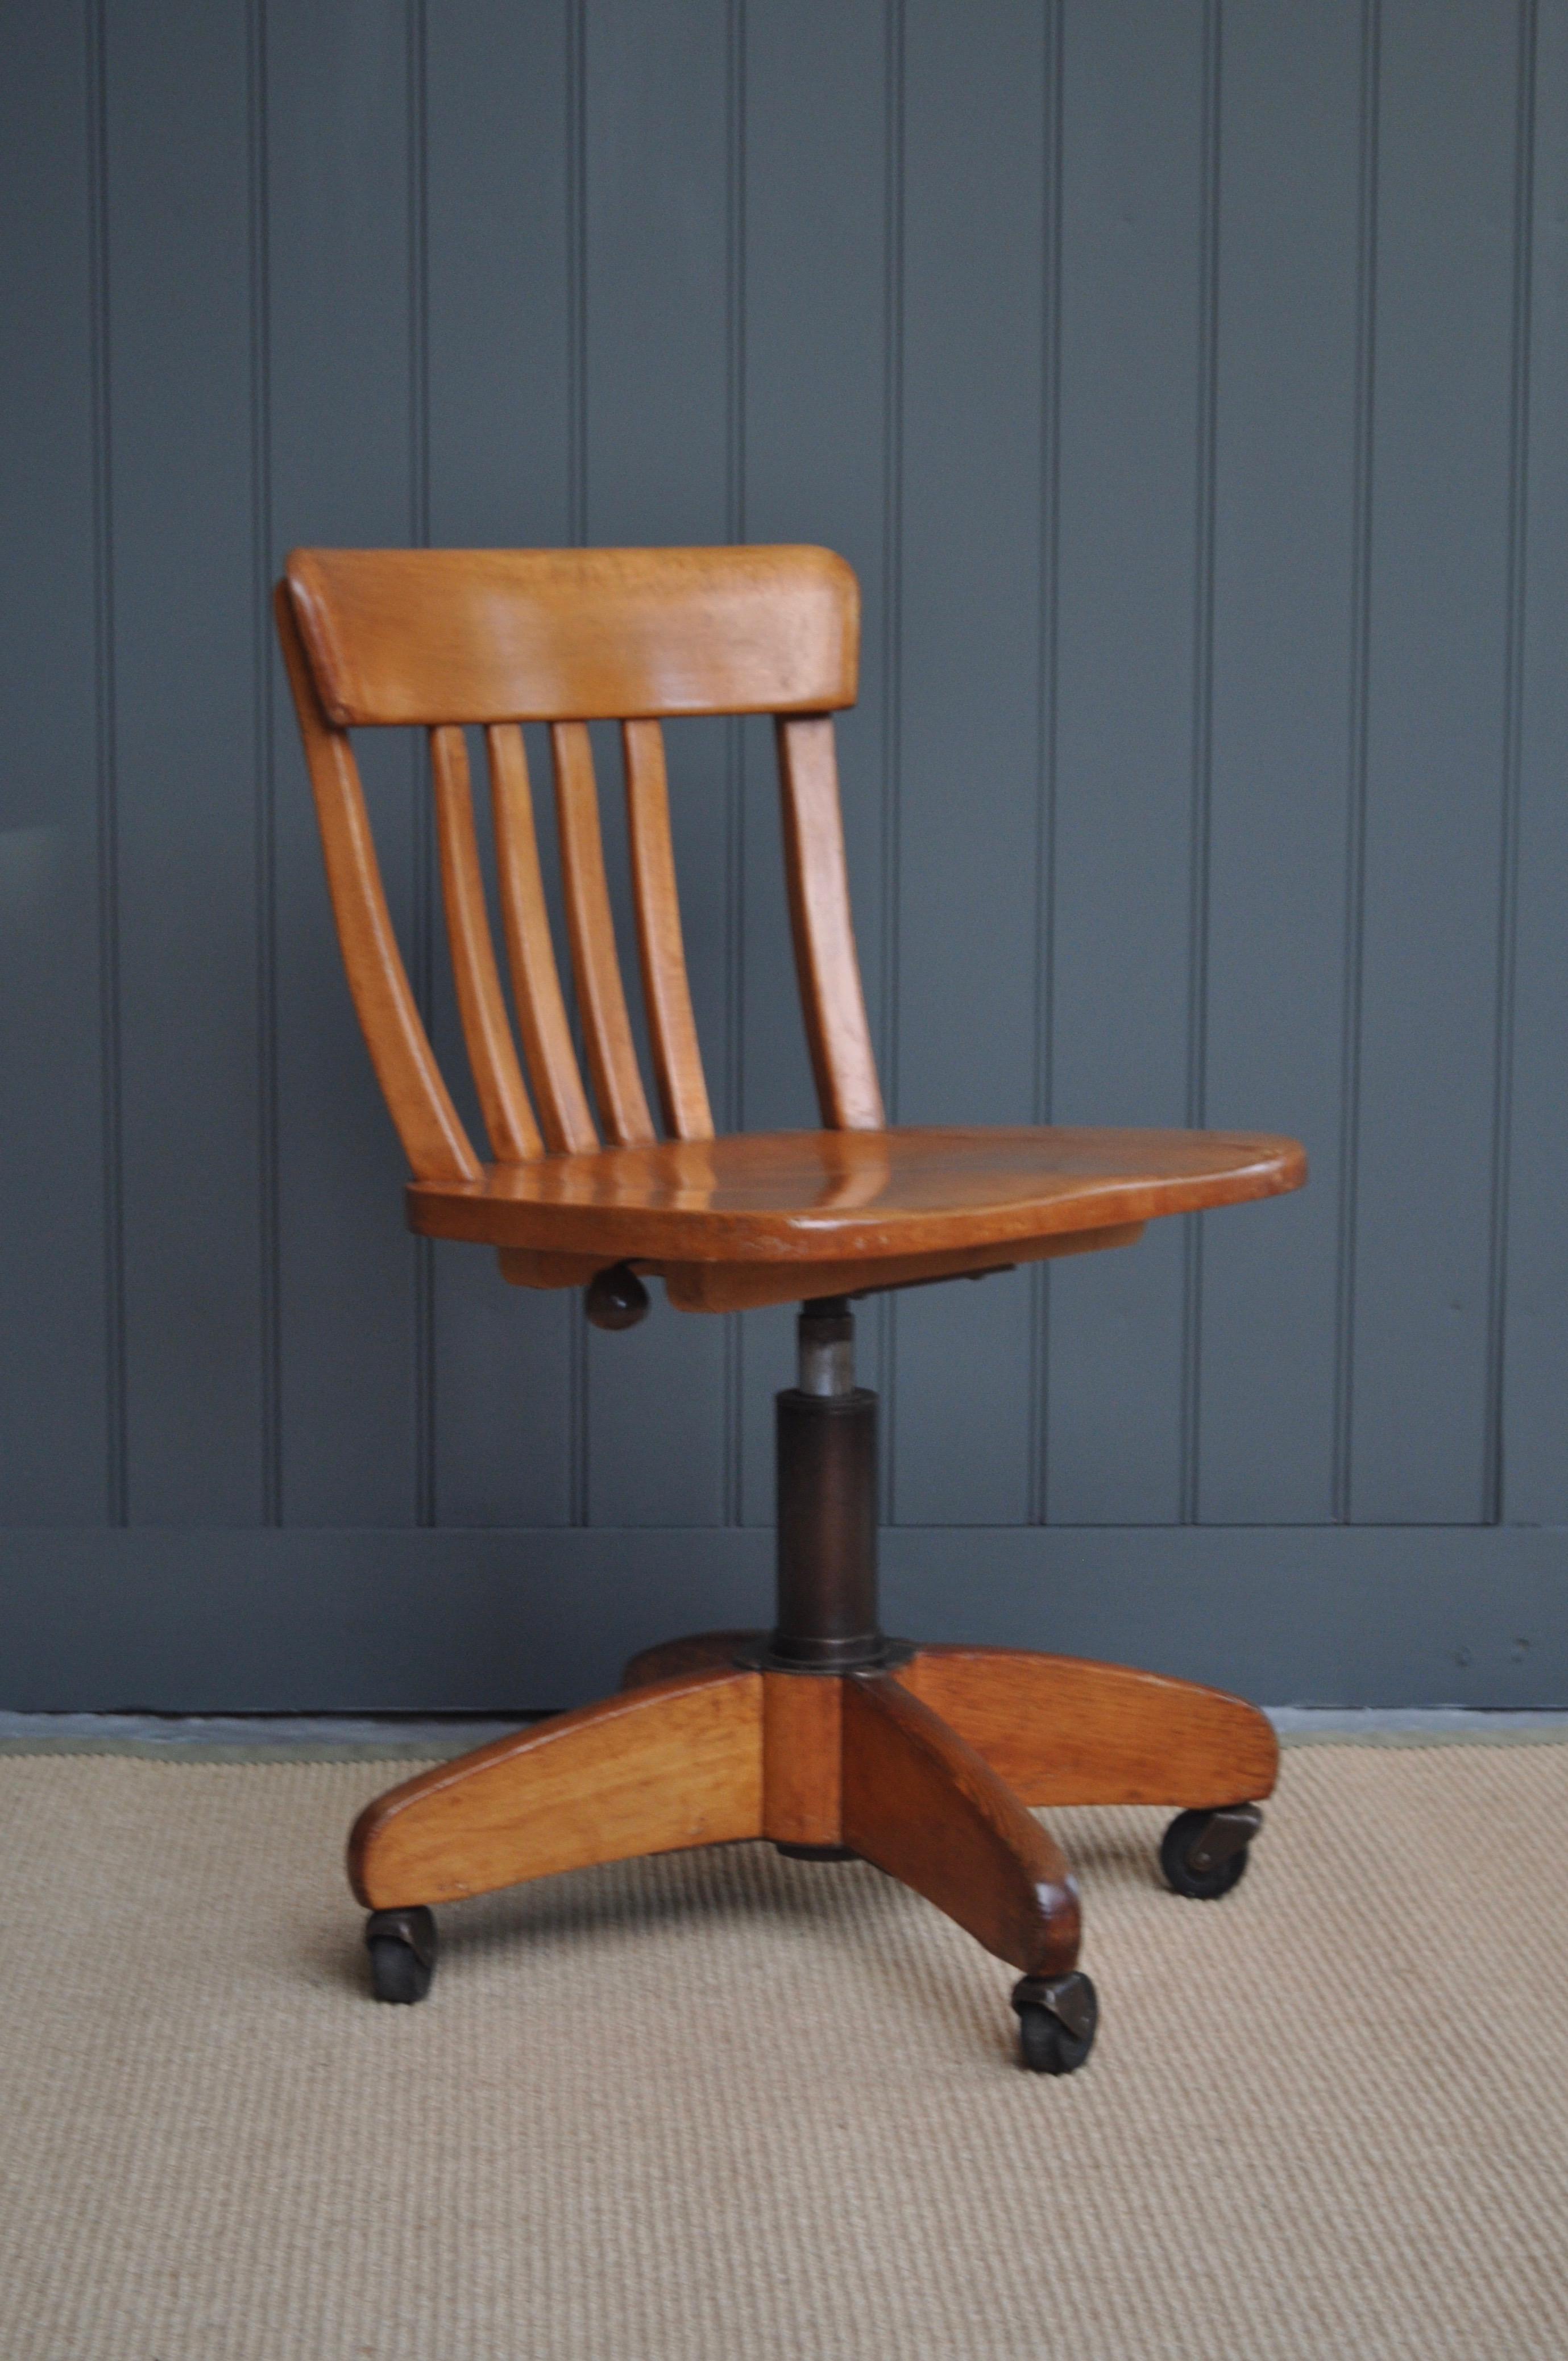 Wooden Desk Chair B Southgate